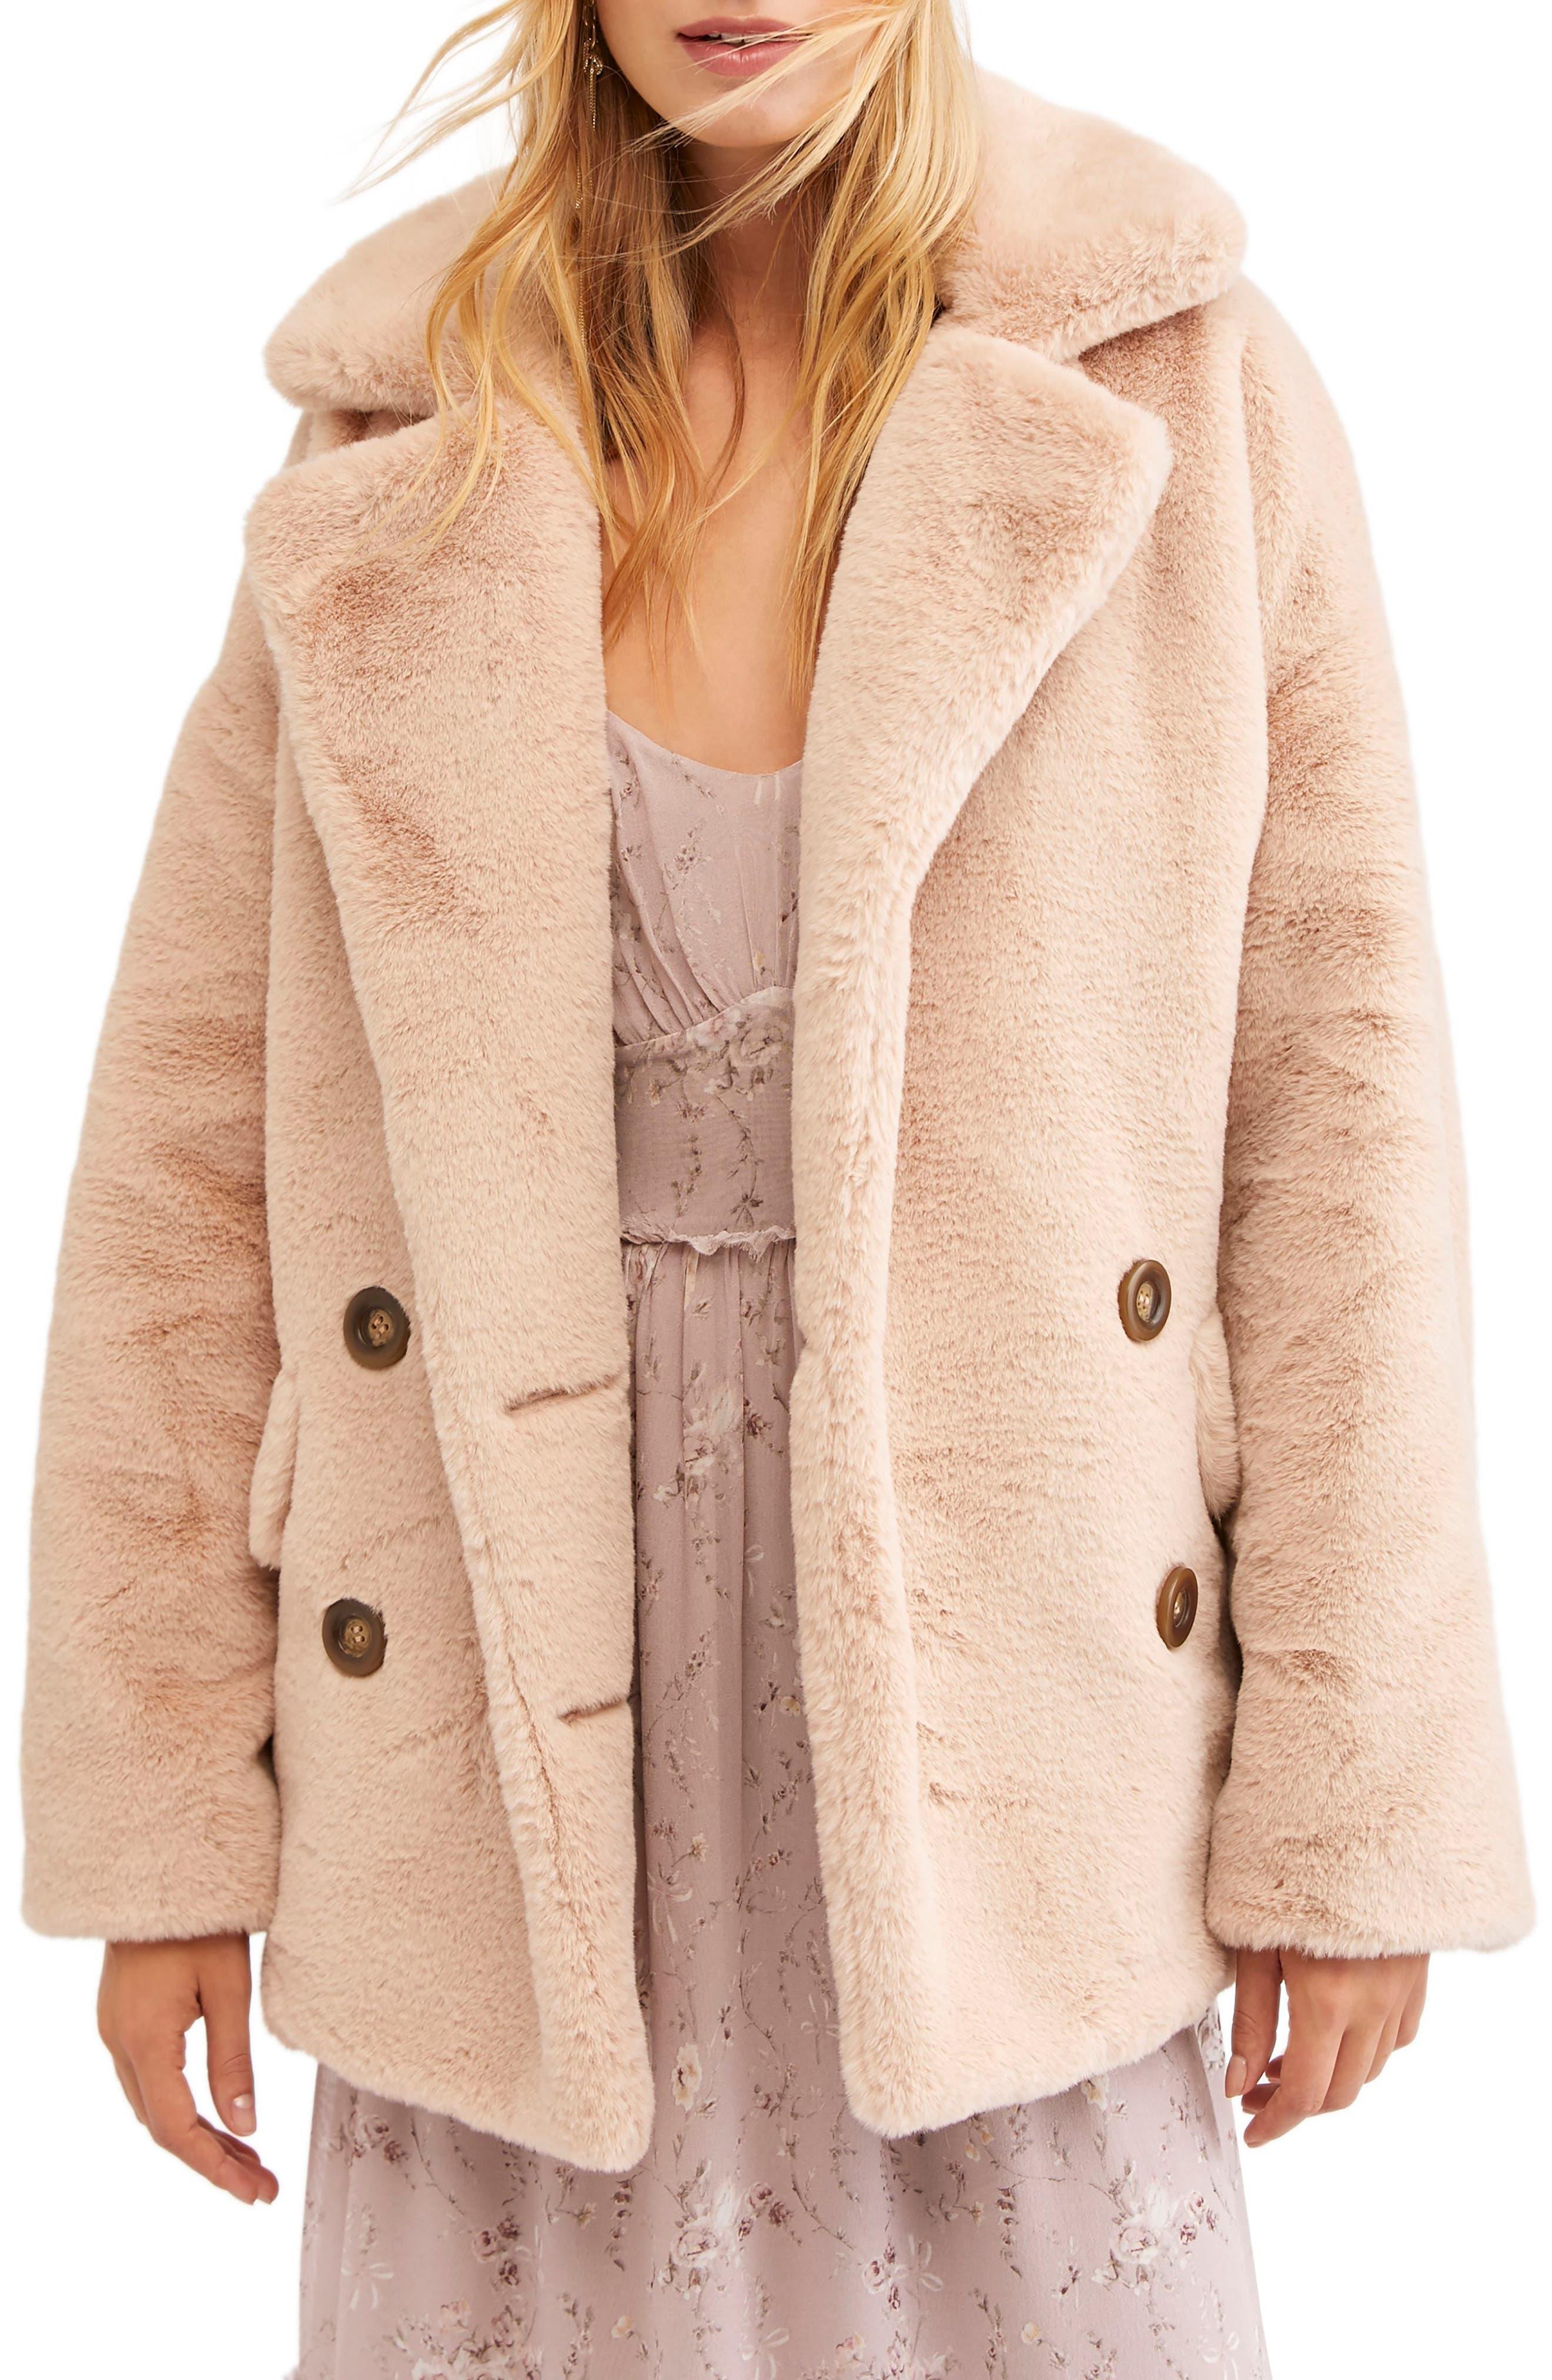 Kate Faux Fur Coat,                             Main thumbnail 1, color,                             ROSE